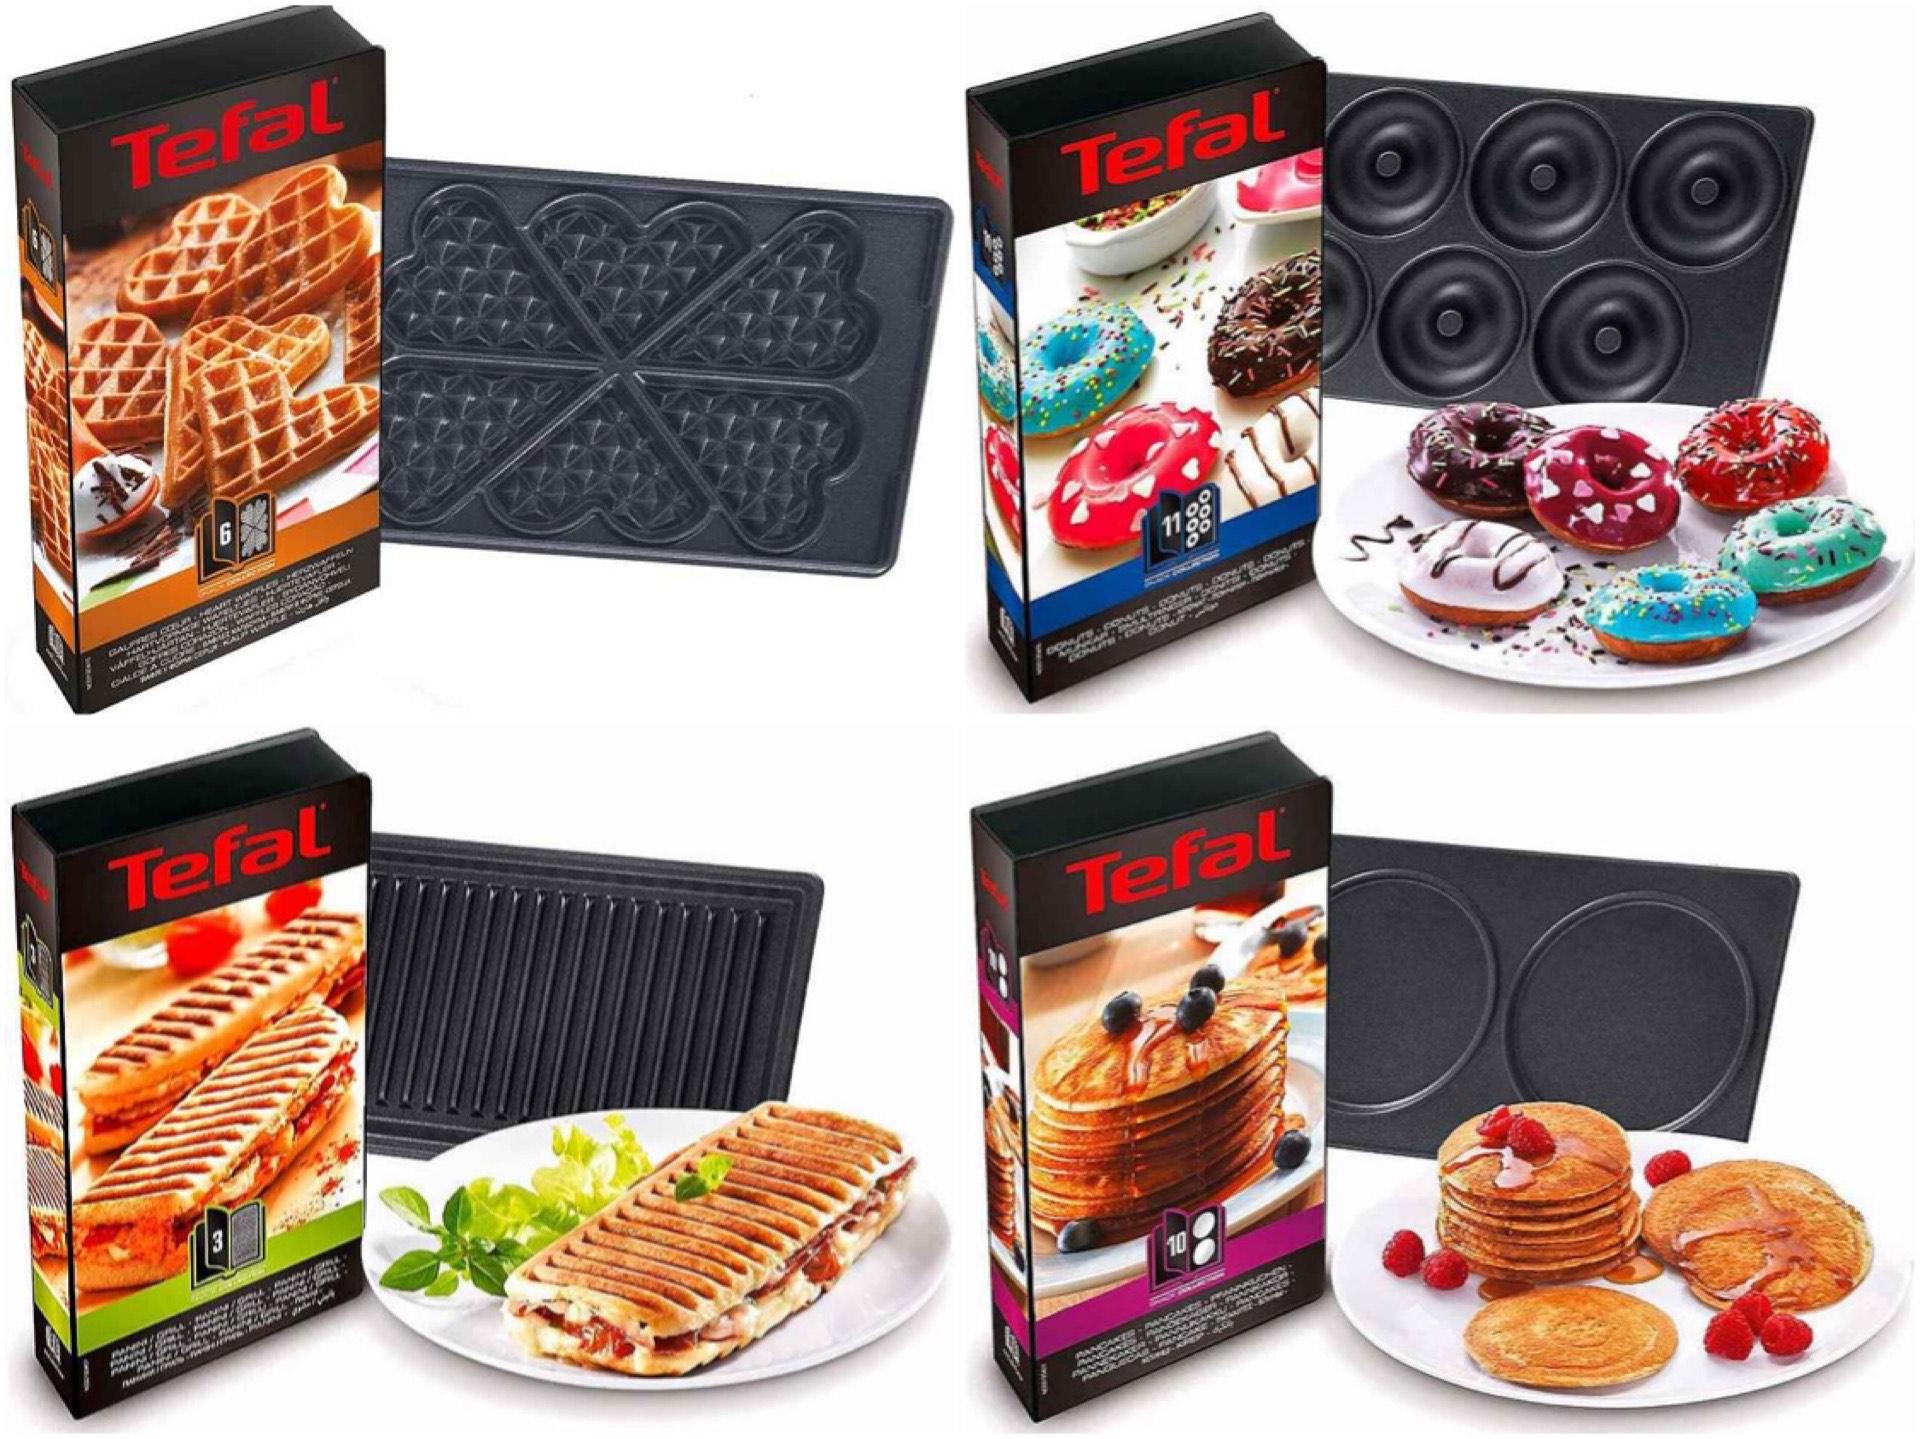 [Otto Neukunden] 2 Platten-Sets für Tefal Snack Collection: Pancakes • Mini-Donuts • Herzwaffel • Panini